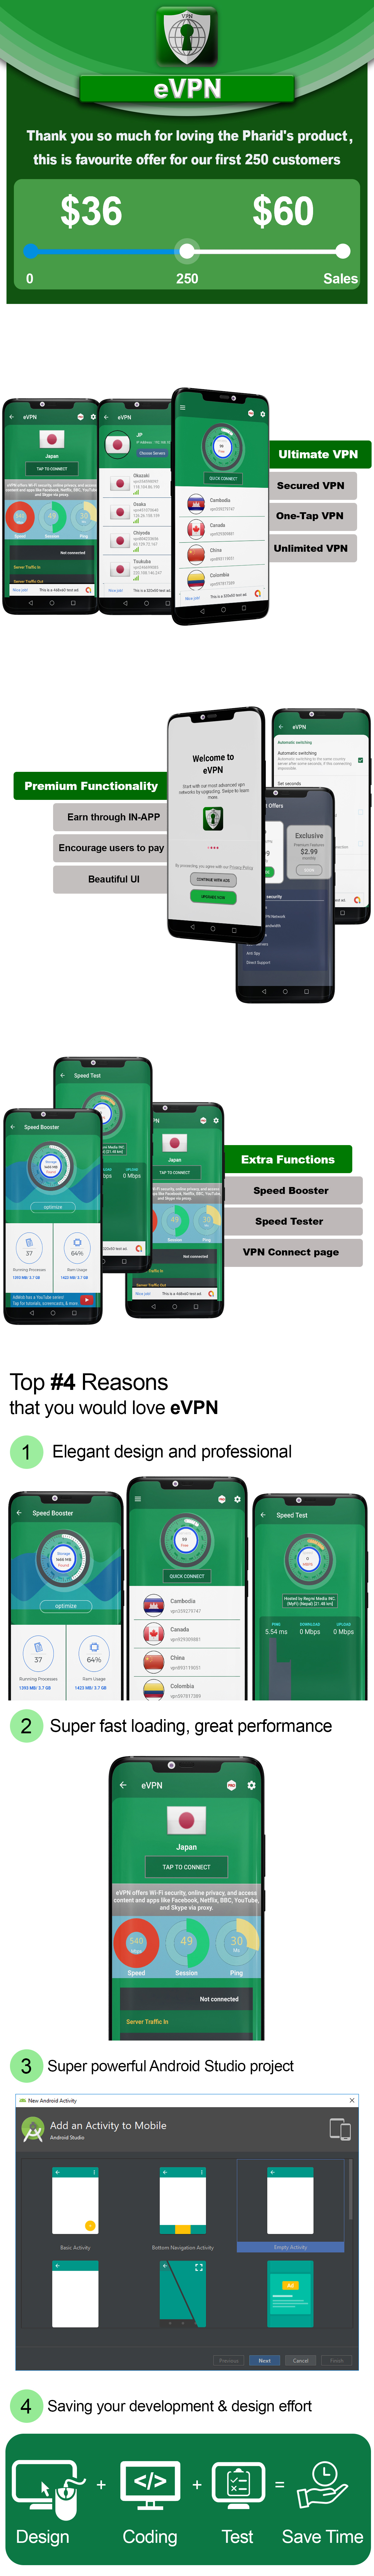 eVPN - Free Ultimate VPN | Android VPN, Billing, Phone Booster, Admob / Push Notification - 3